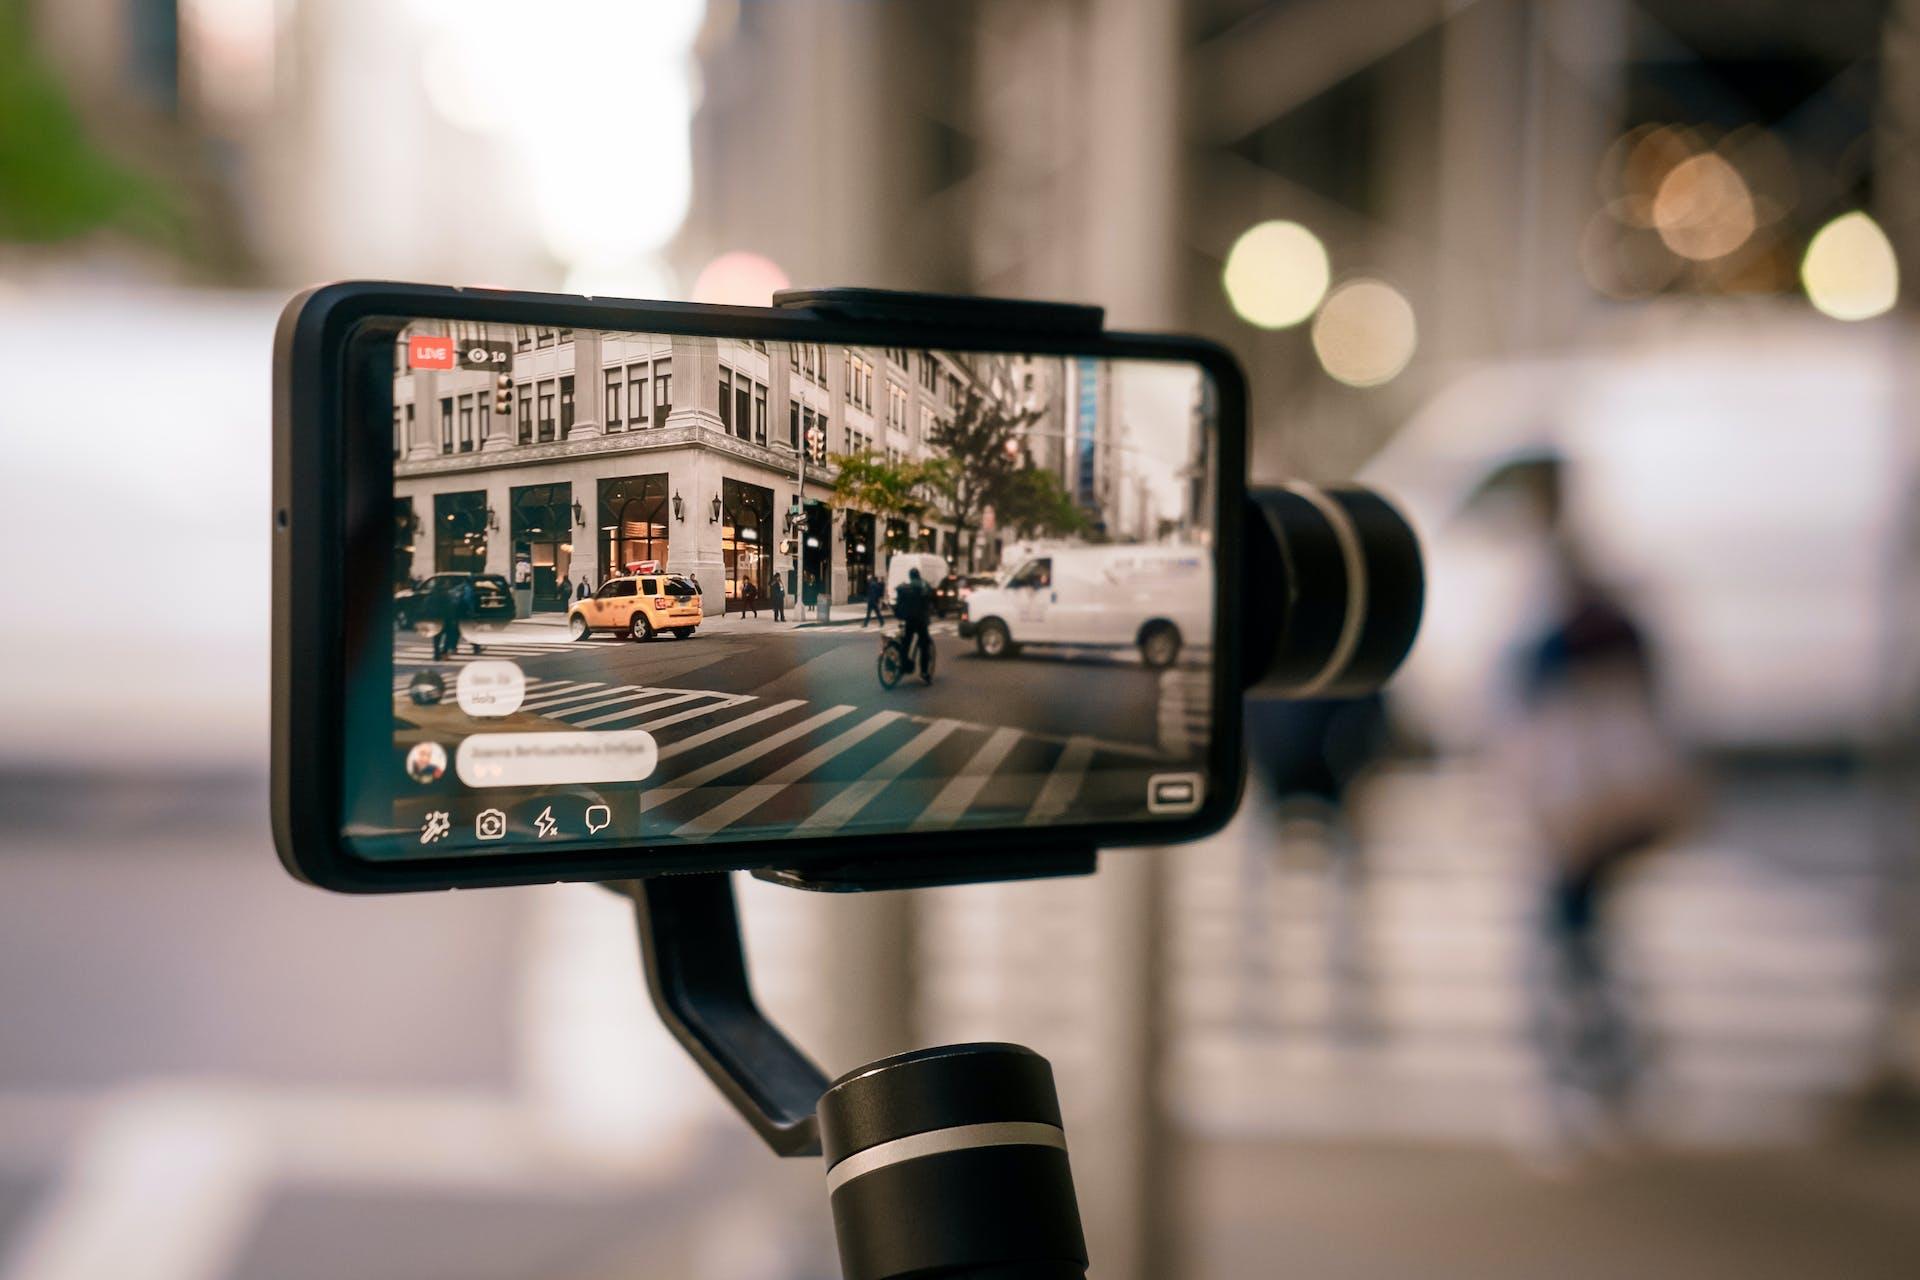 A live video of a street filmed through a mobile phone